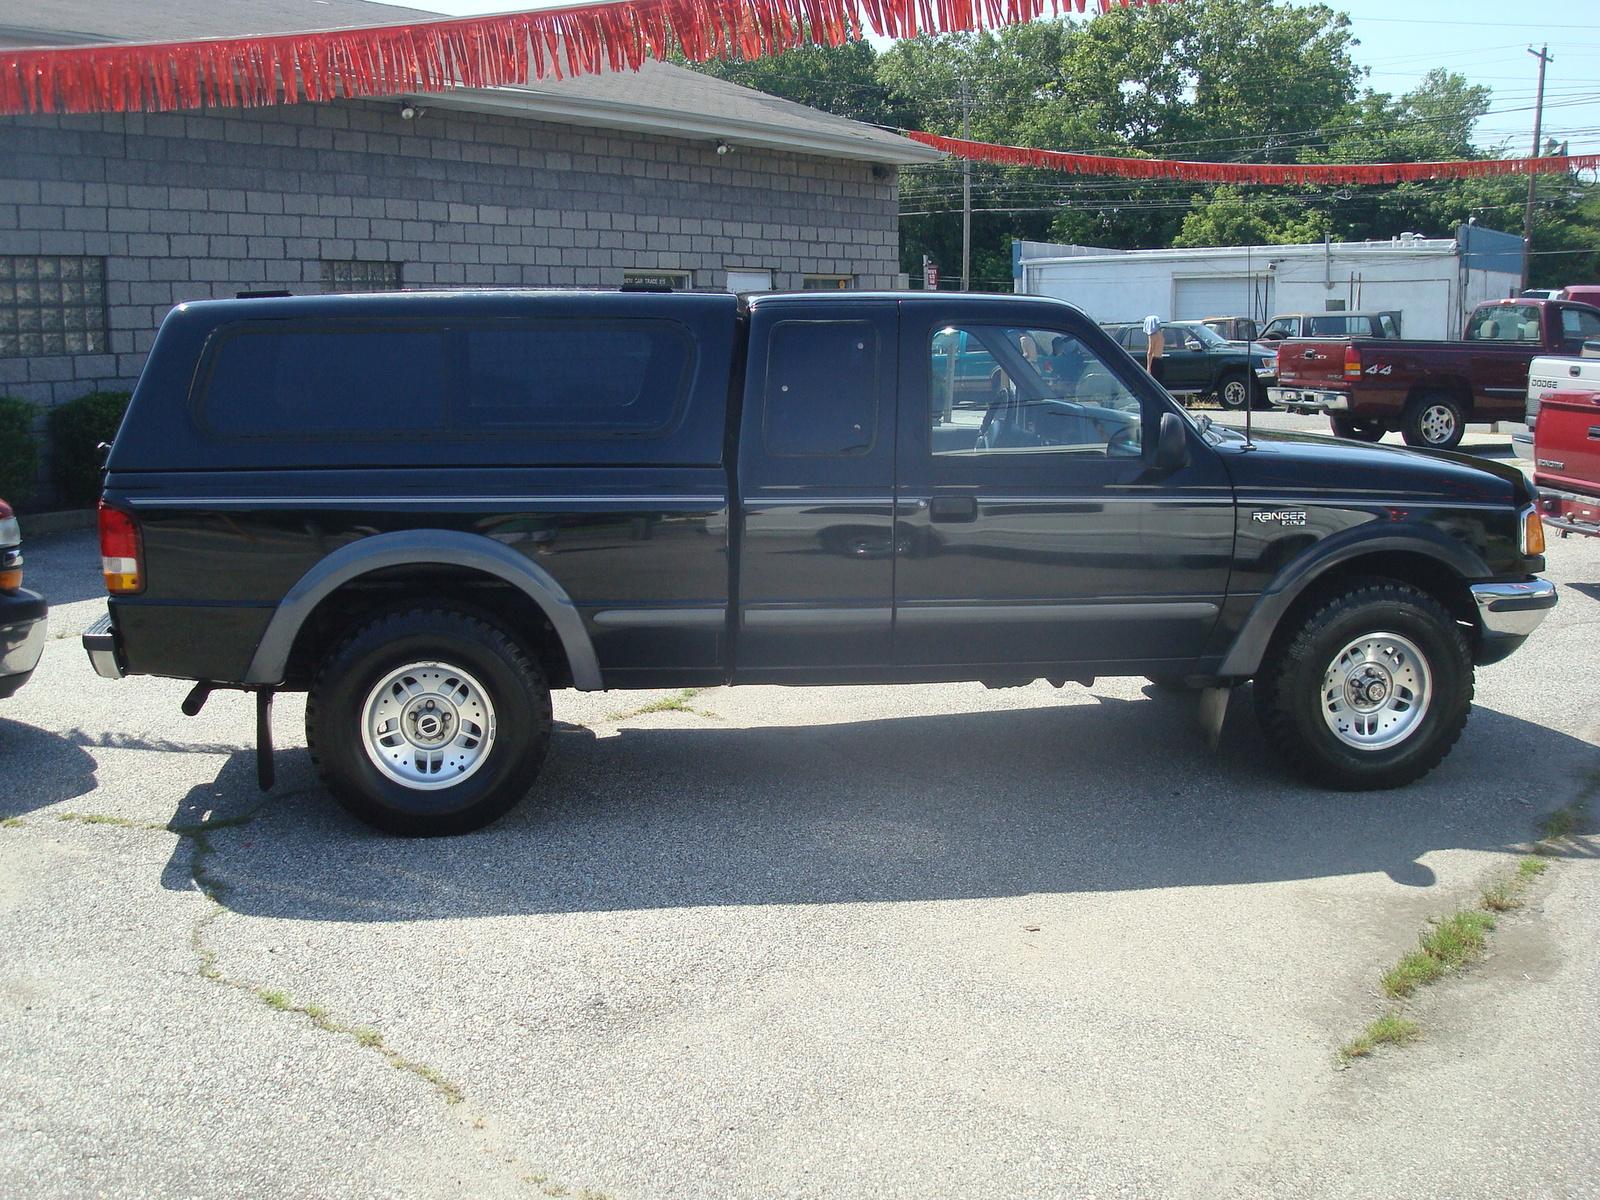 1994 ford ranger extended cab wheelbase. Black Bedroom Furniture Sets. Home Design Ideas